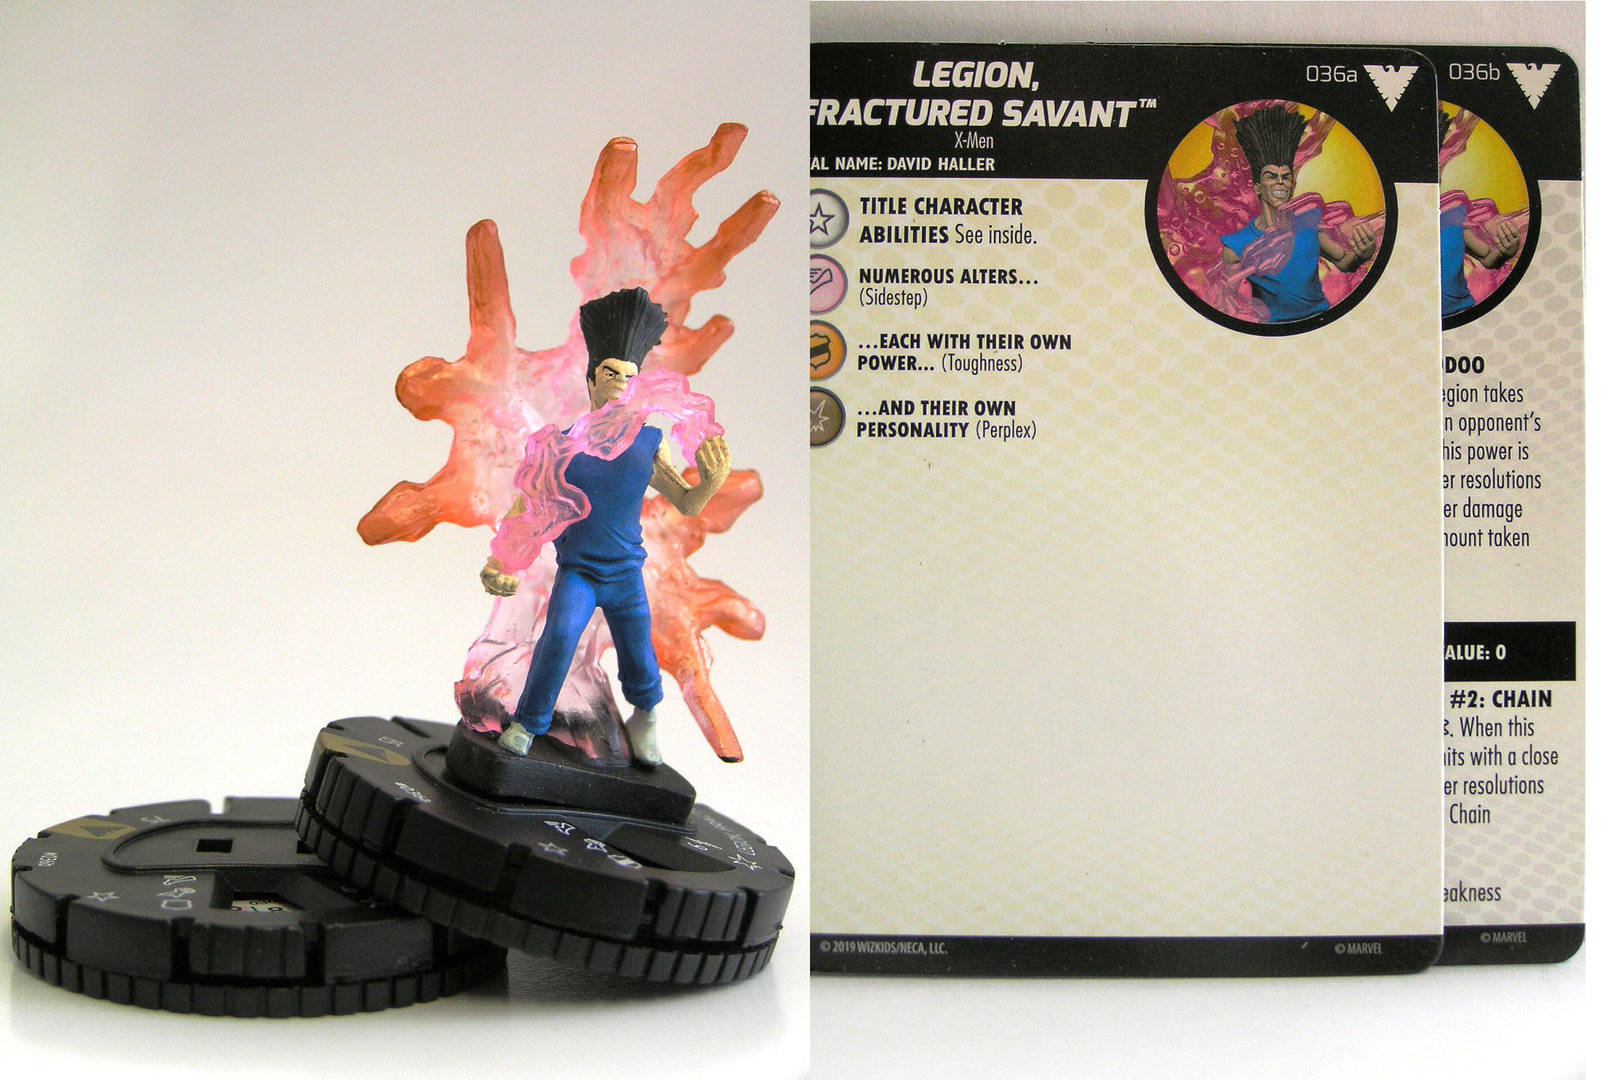 Heroclix X-Men Animated Series Dark Phoenix # 036 A B Legion Fractured Savant